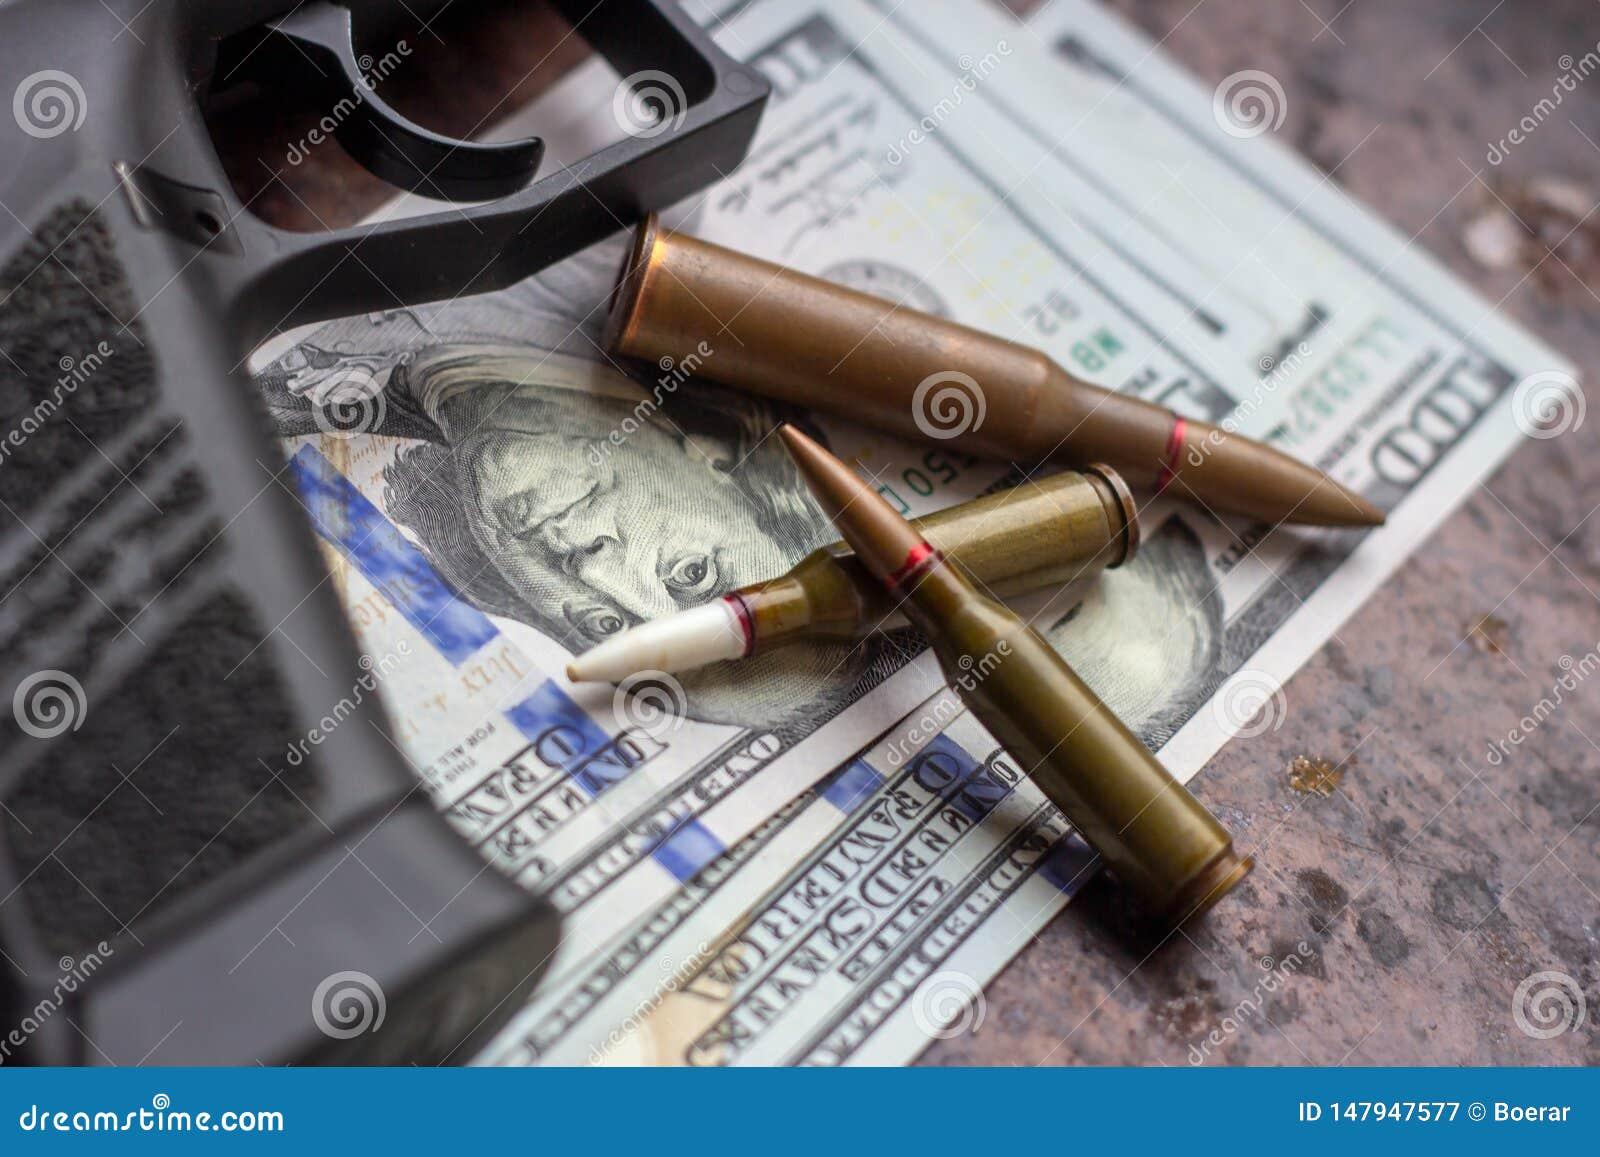 Czarni pociski na Ameryka?skim dolara tle i pistolet Militarny przemys?, wojna, globalny handel broni?, broni sprzeda?, kontrakta